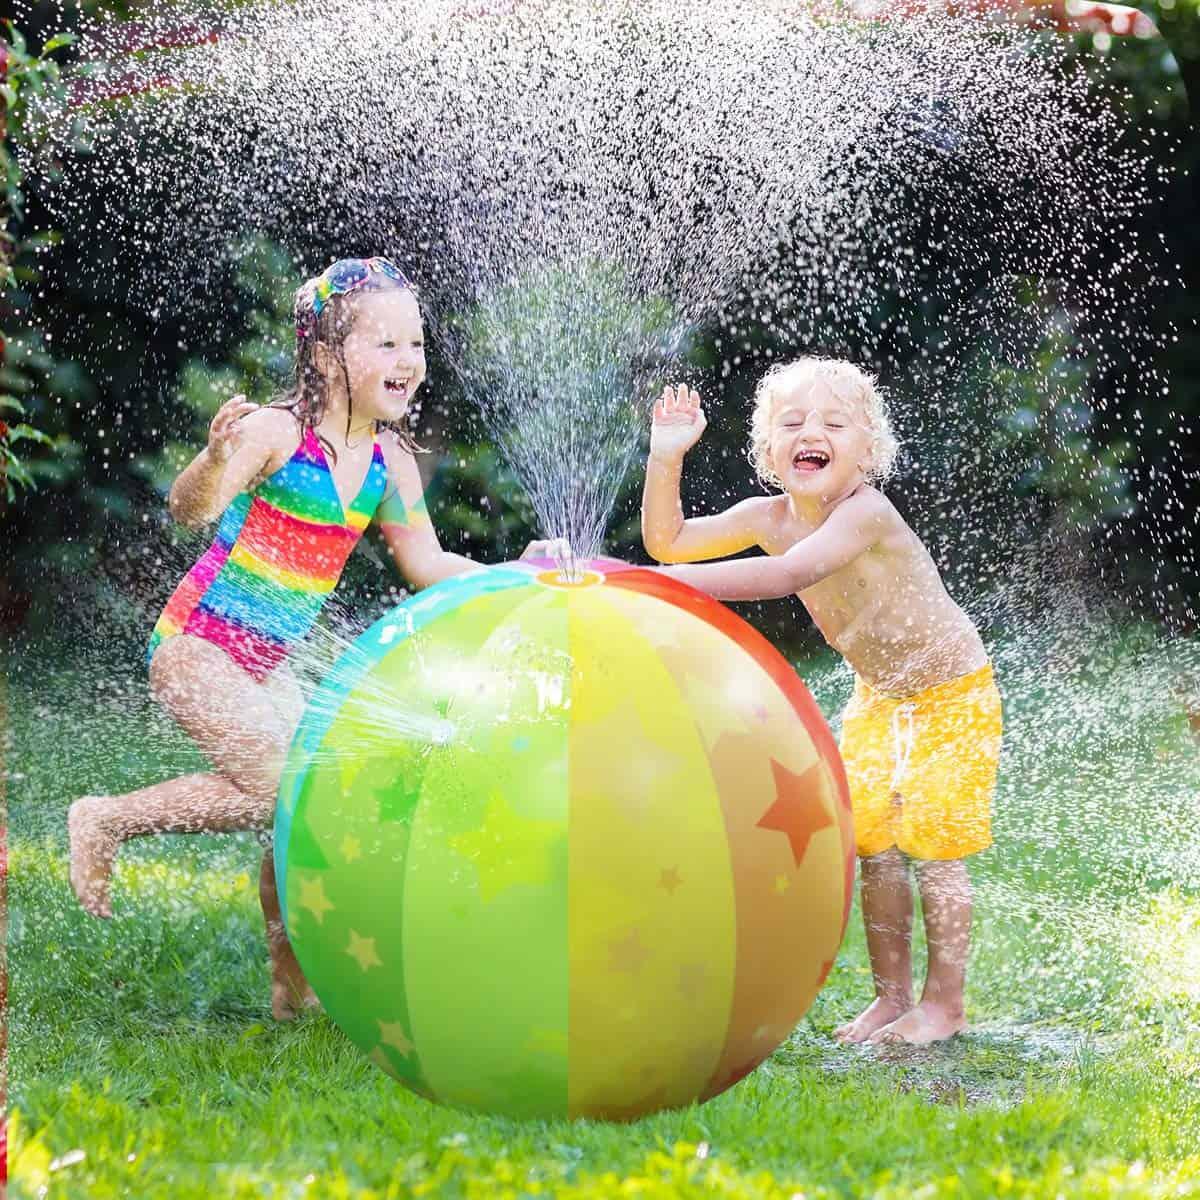 Best Sprinklers For Kids 2020